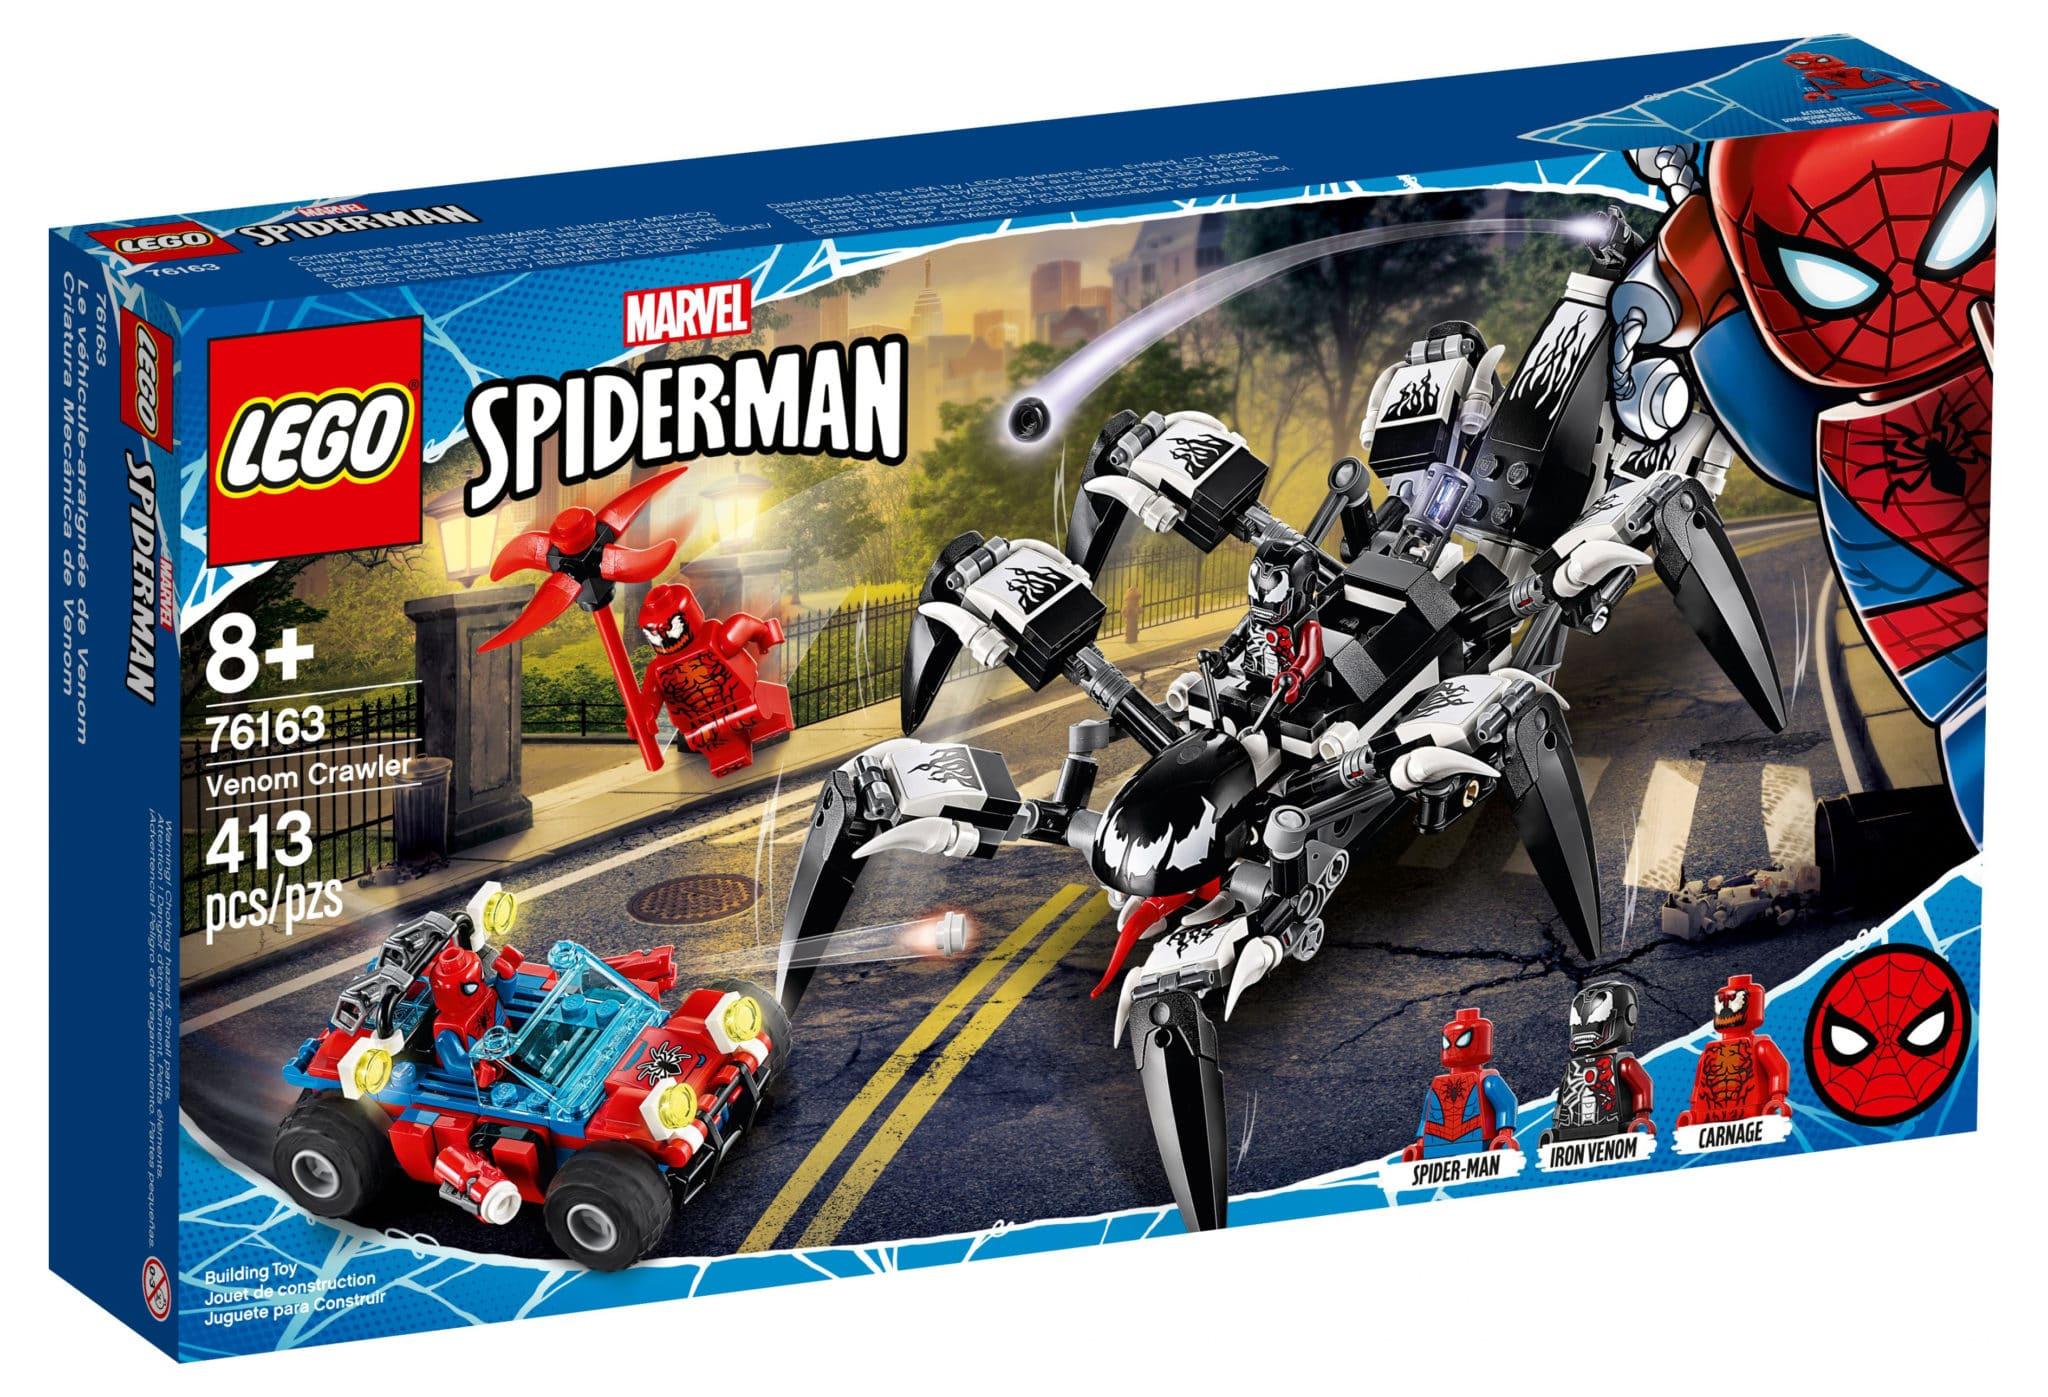 LEGO 76163 Venom Krabbler